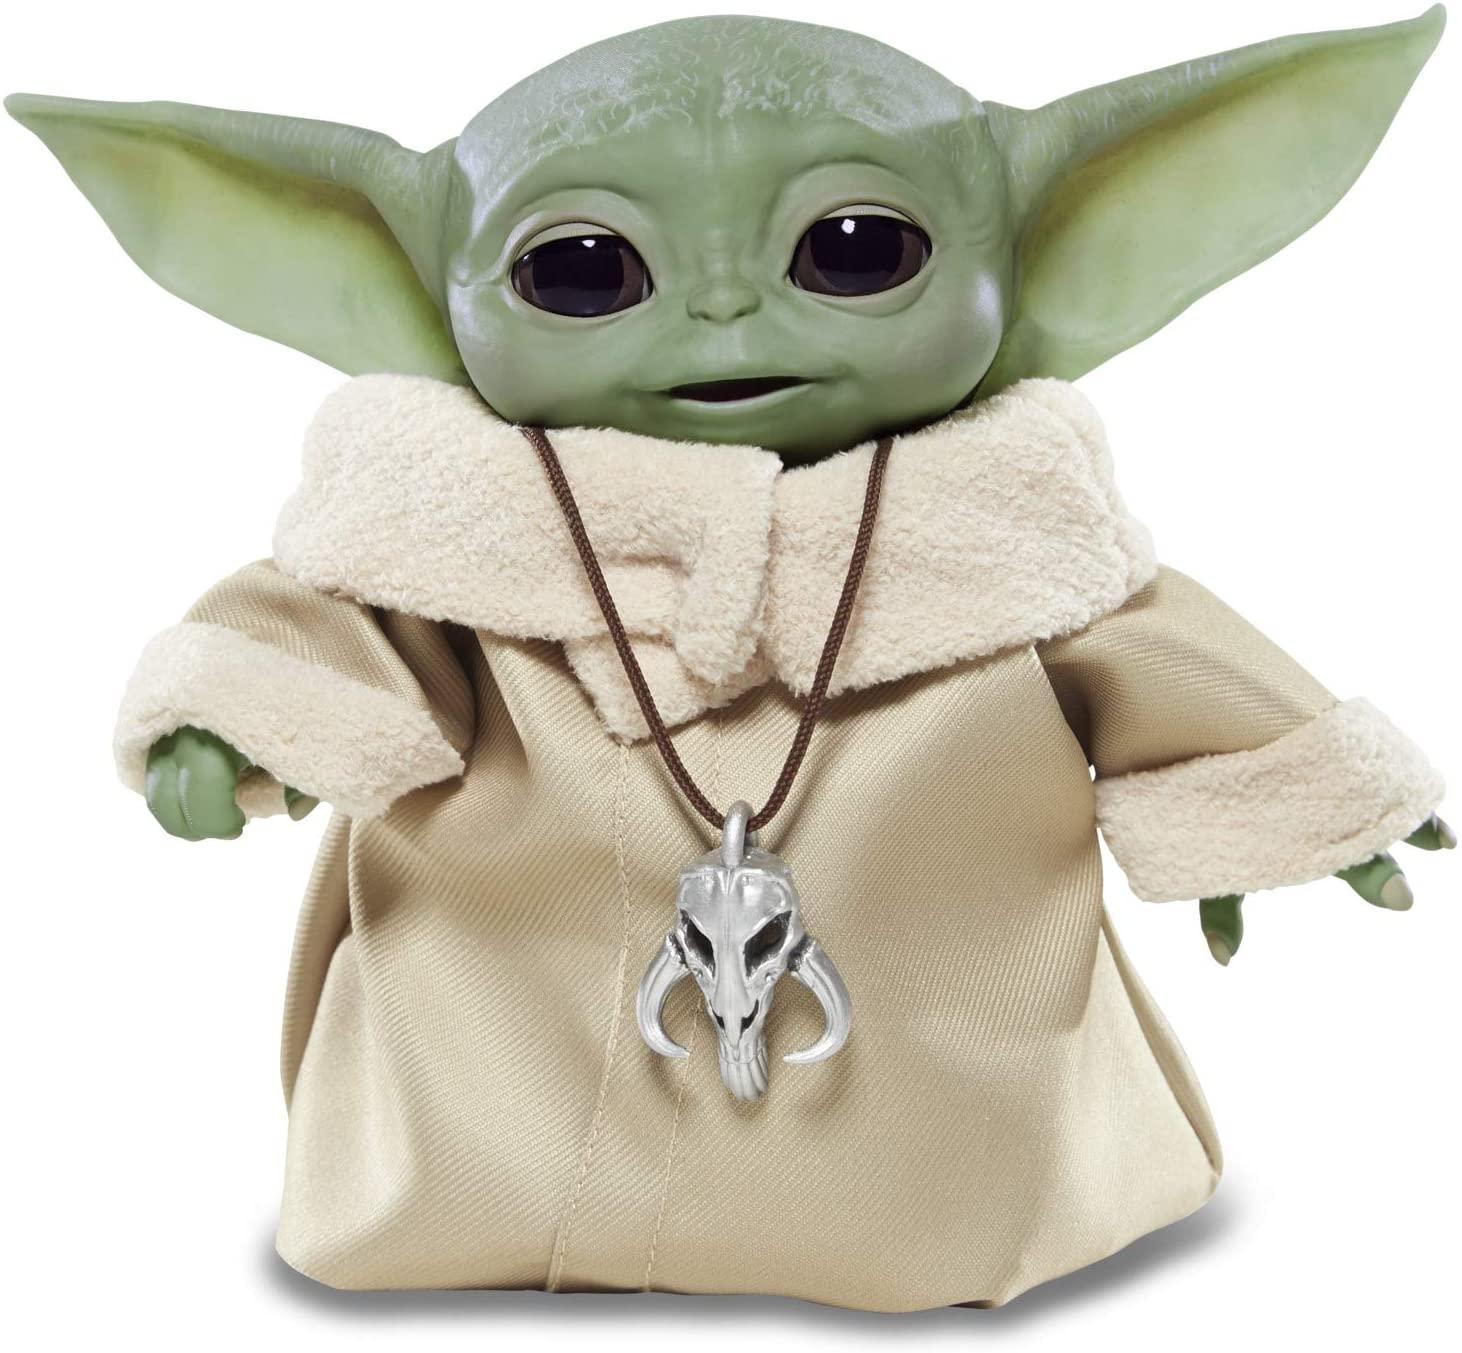 Photo de la figurine Bébé Yoda Interactive